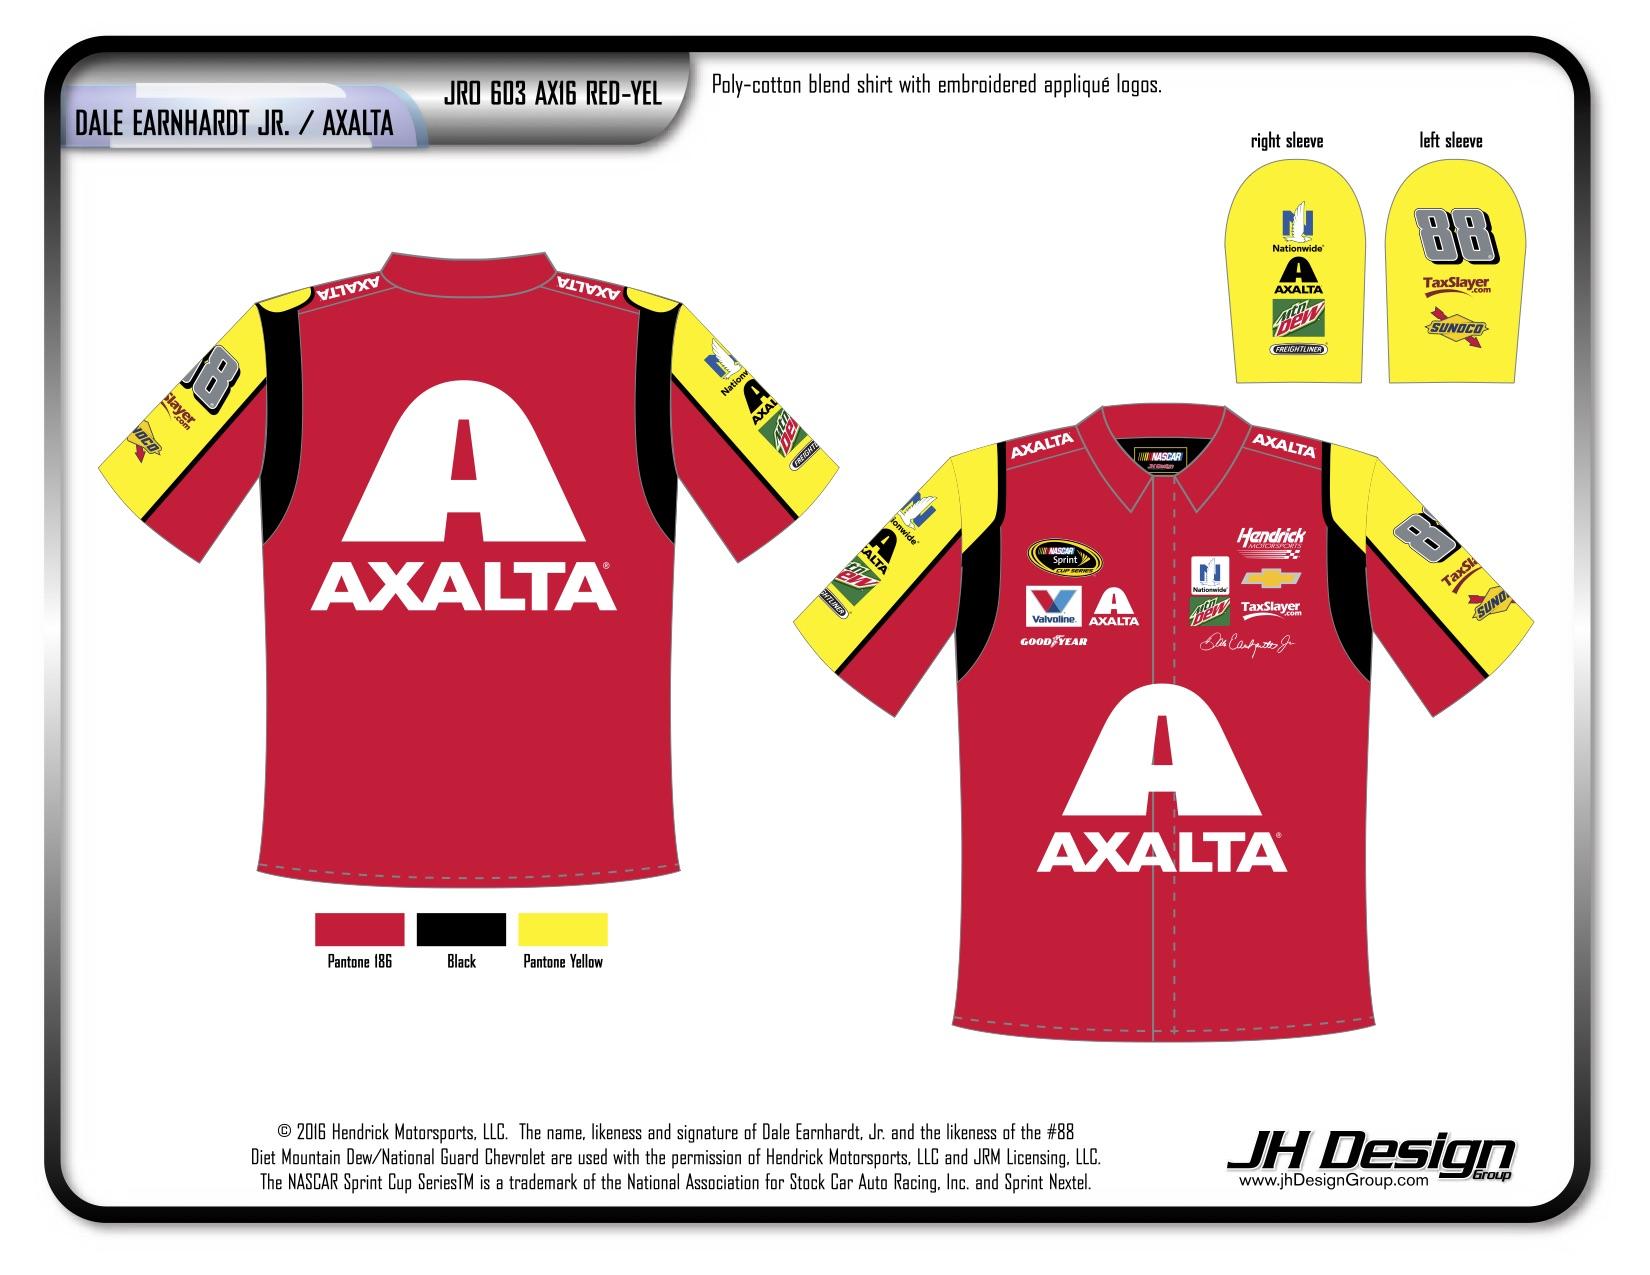 JR0 603 AX16 RED-YEL